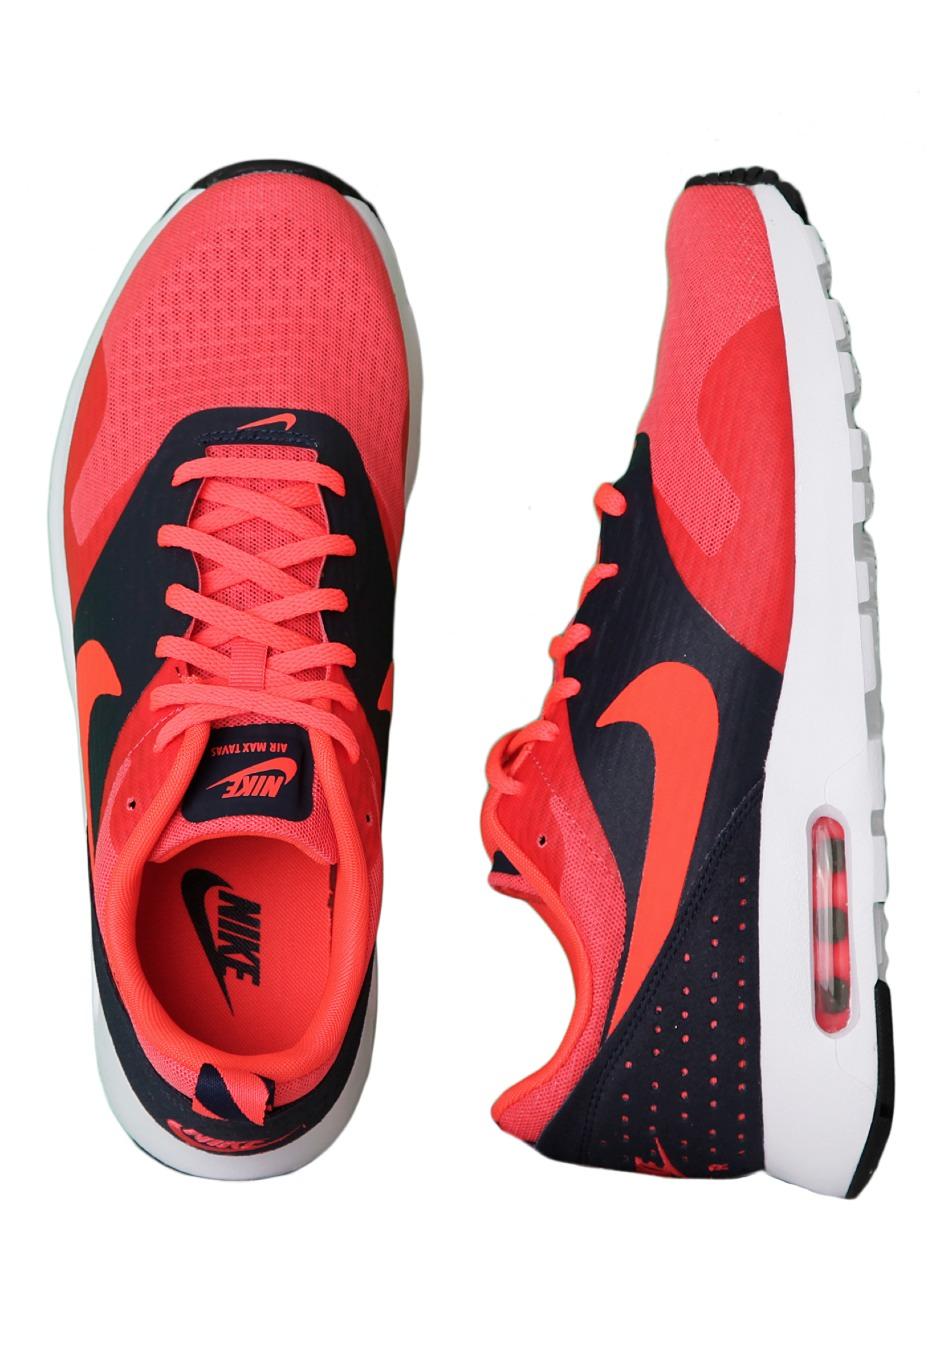 half off 0cea7 e90f0 Nike - Air Max Tavas Essential Rio Bright Crimson Dark Obsidian - Shoes -  Impericon.com Worldwide